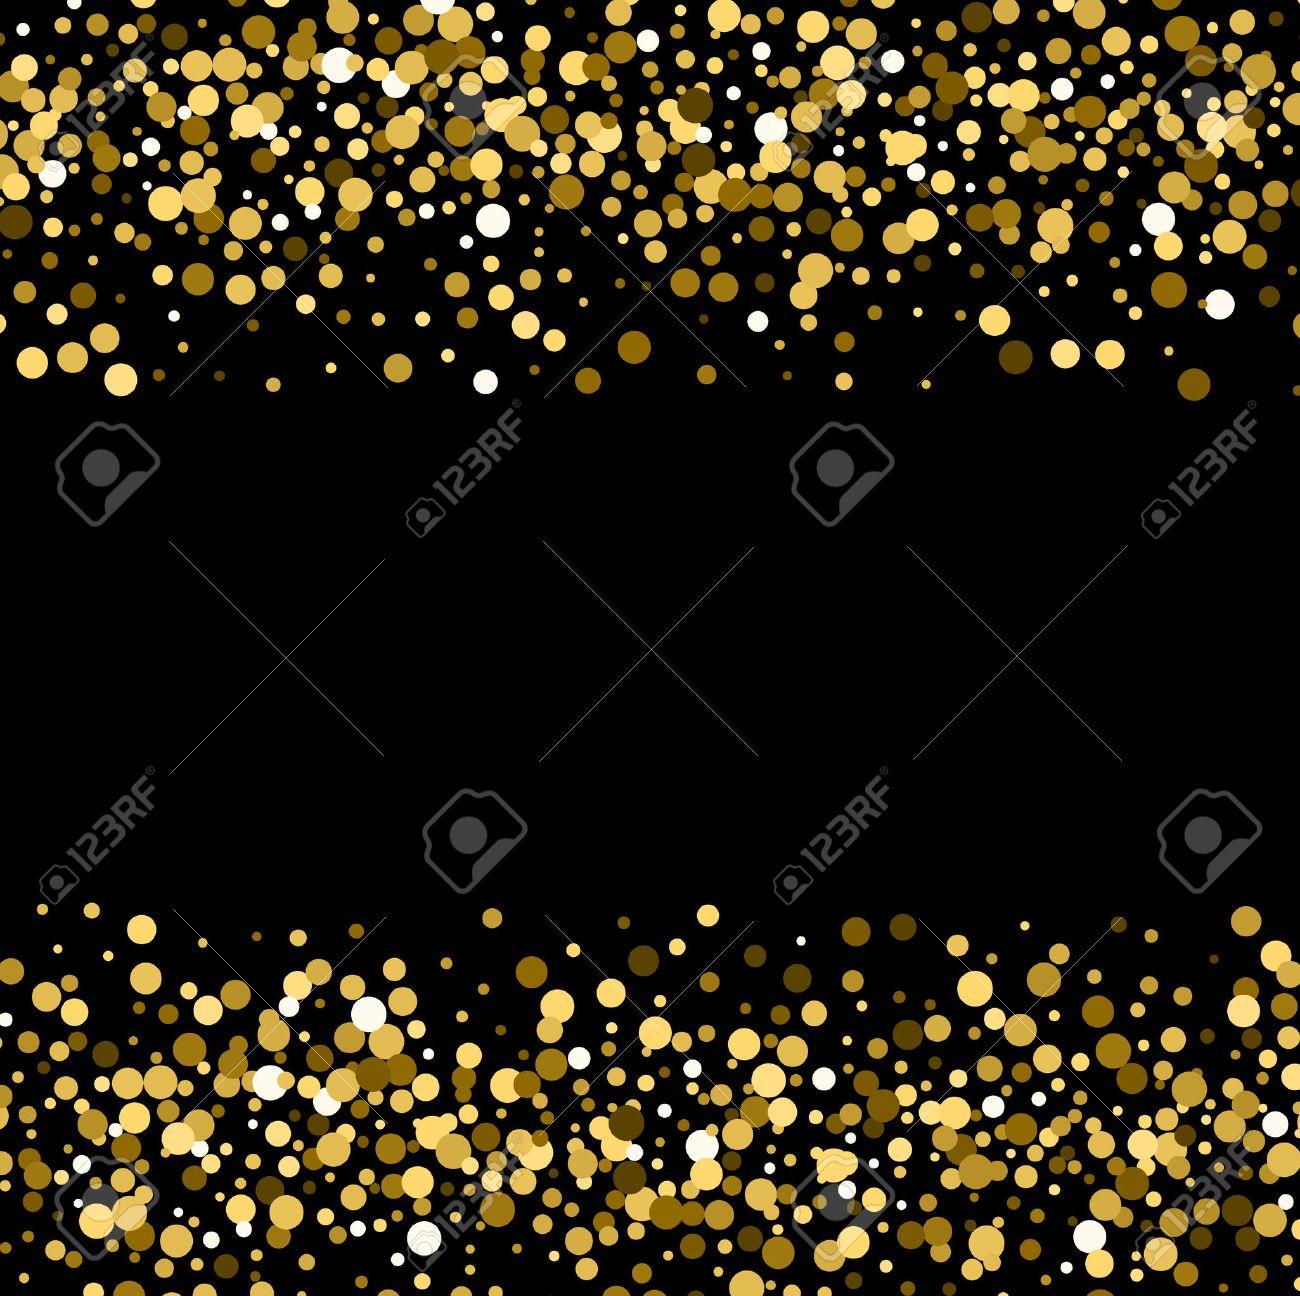 Gold sparkles on black background. Gold glitter background. - 51564131